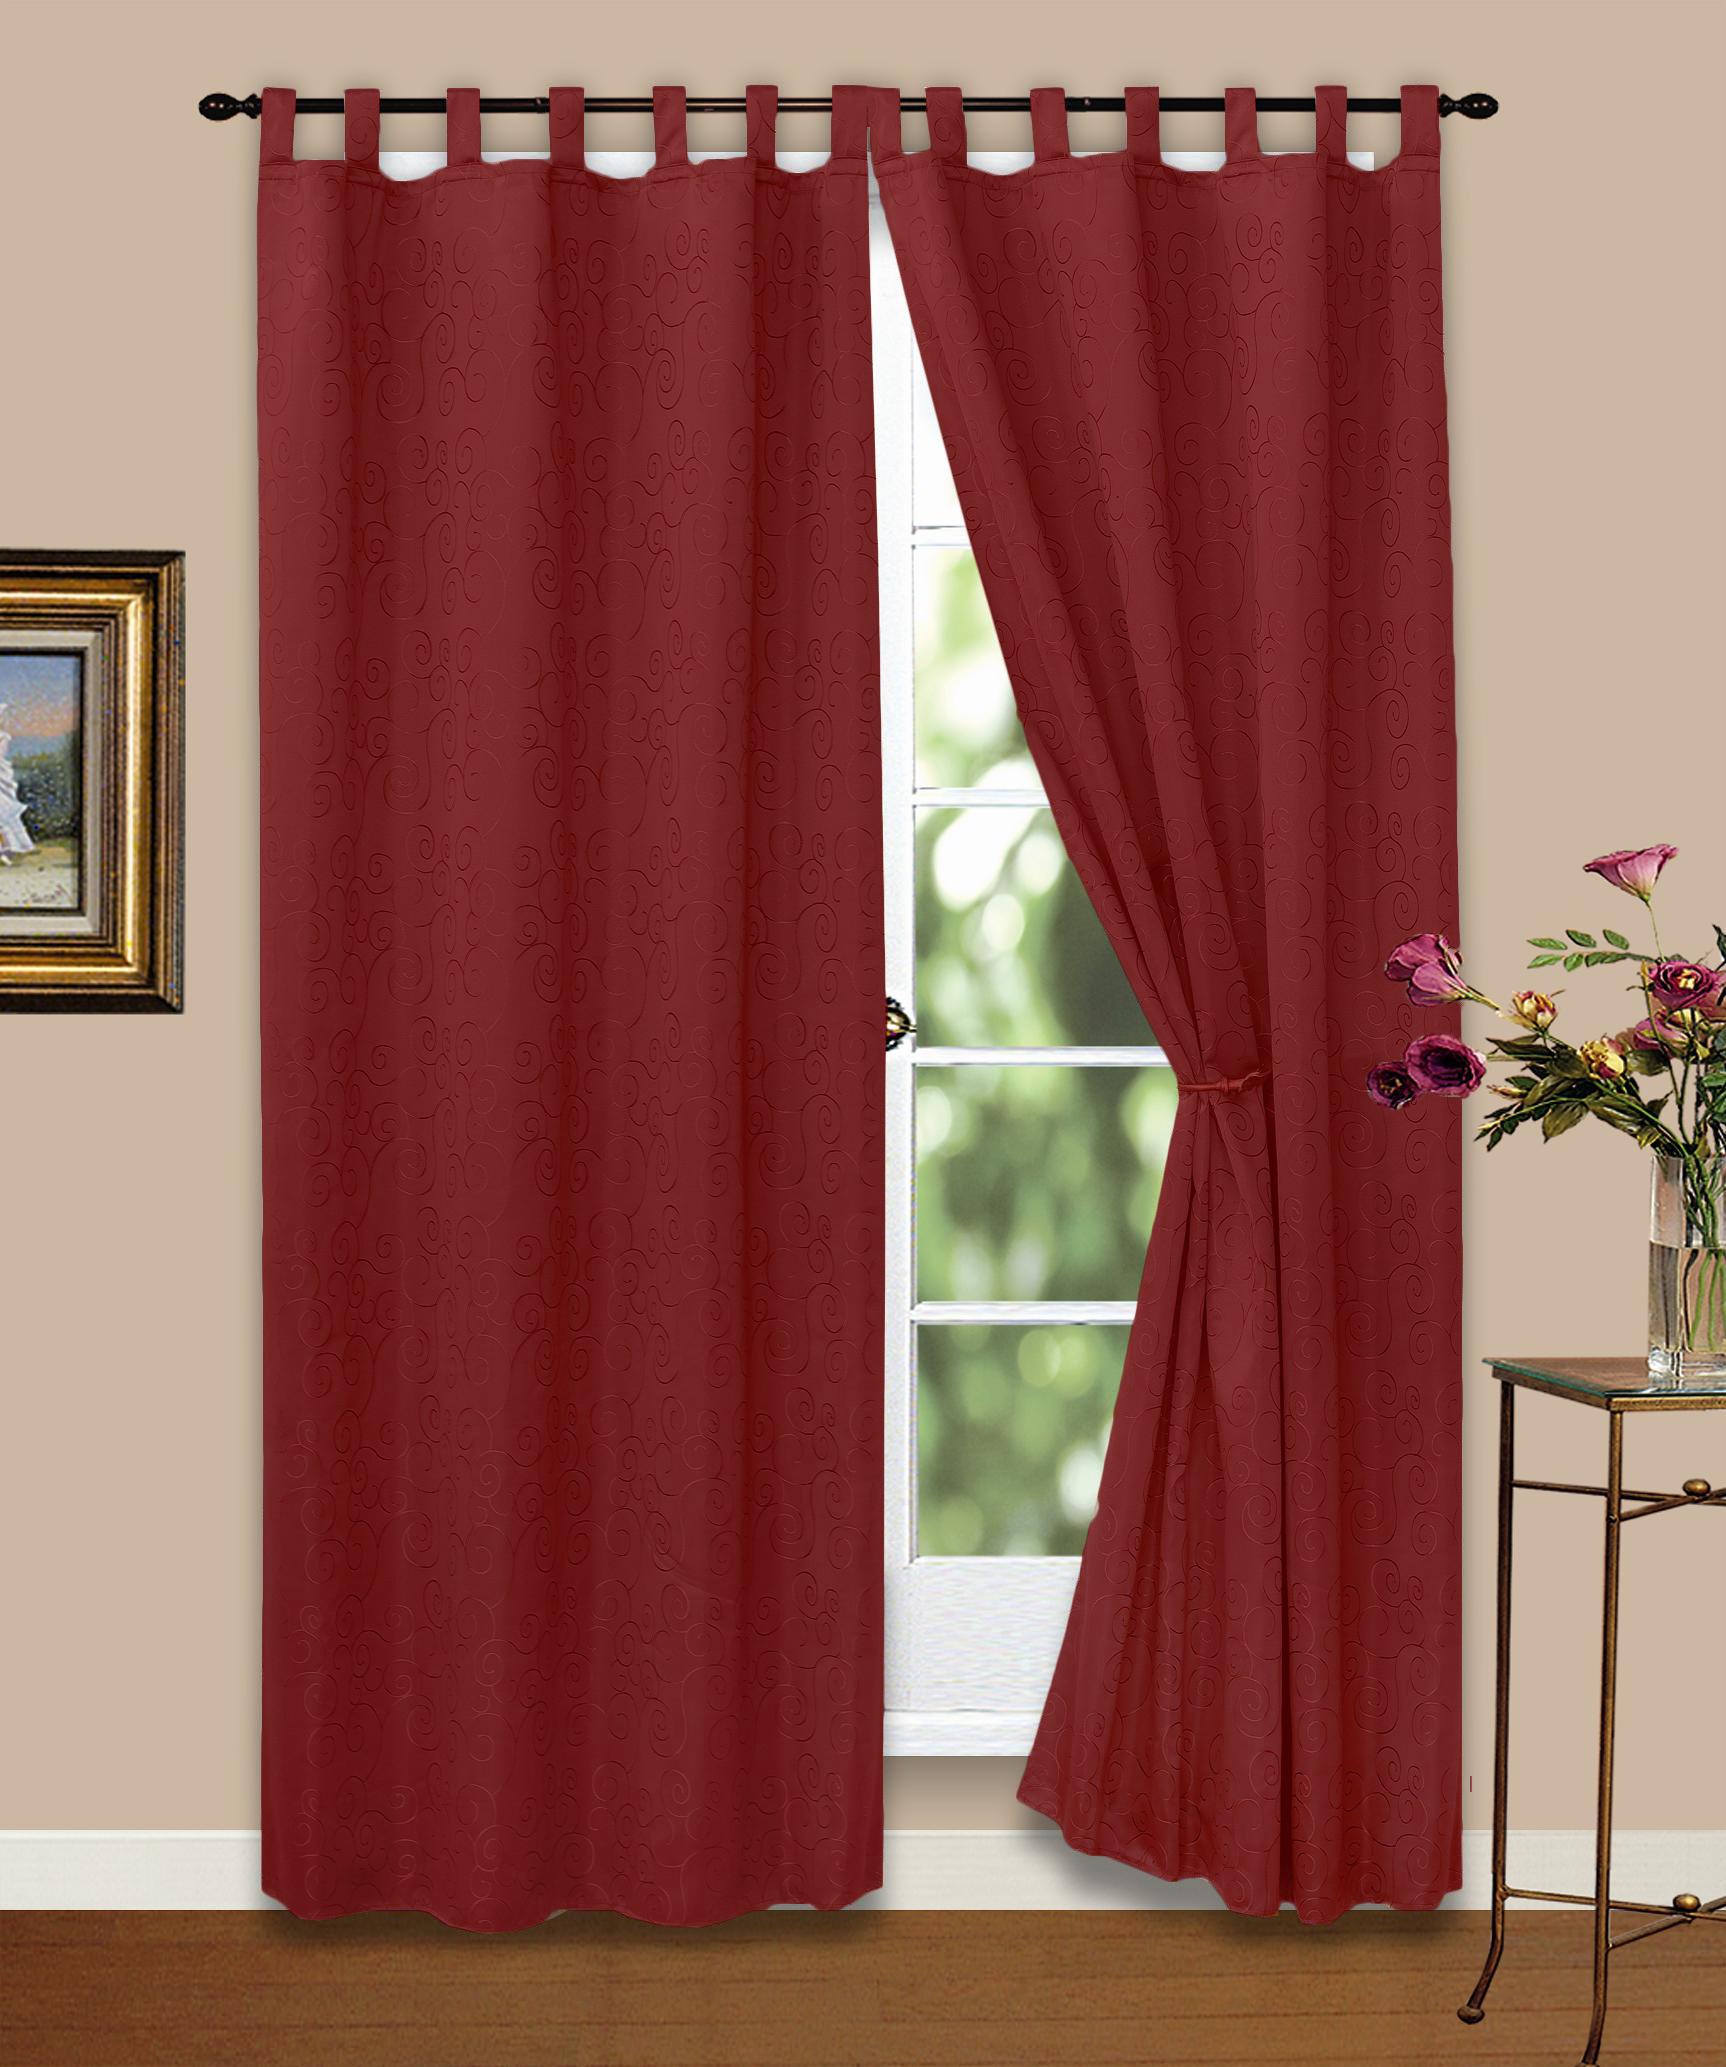 vorhang gardine blickdicht ornamente wein rot 140x245 cm ebay. Black Bedroom Furniture Sets. Home Design Ideas